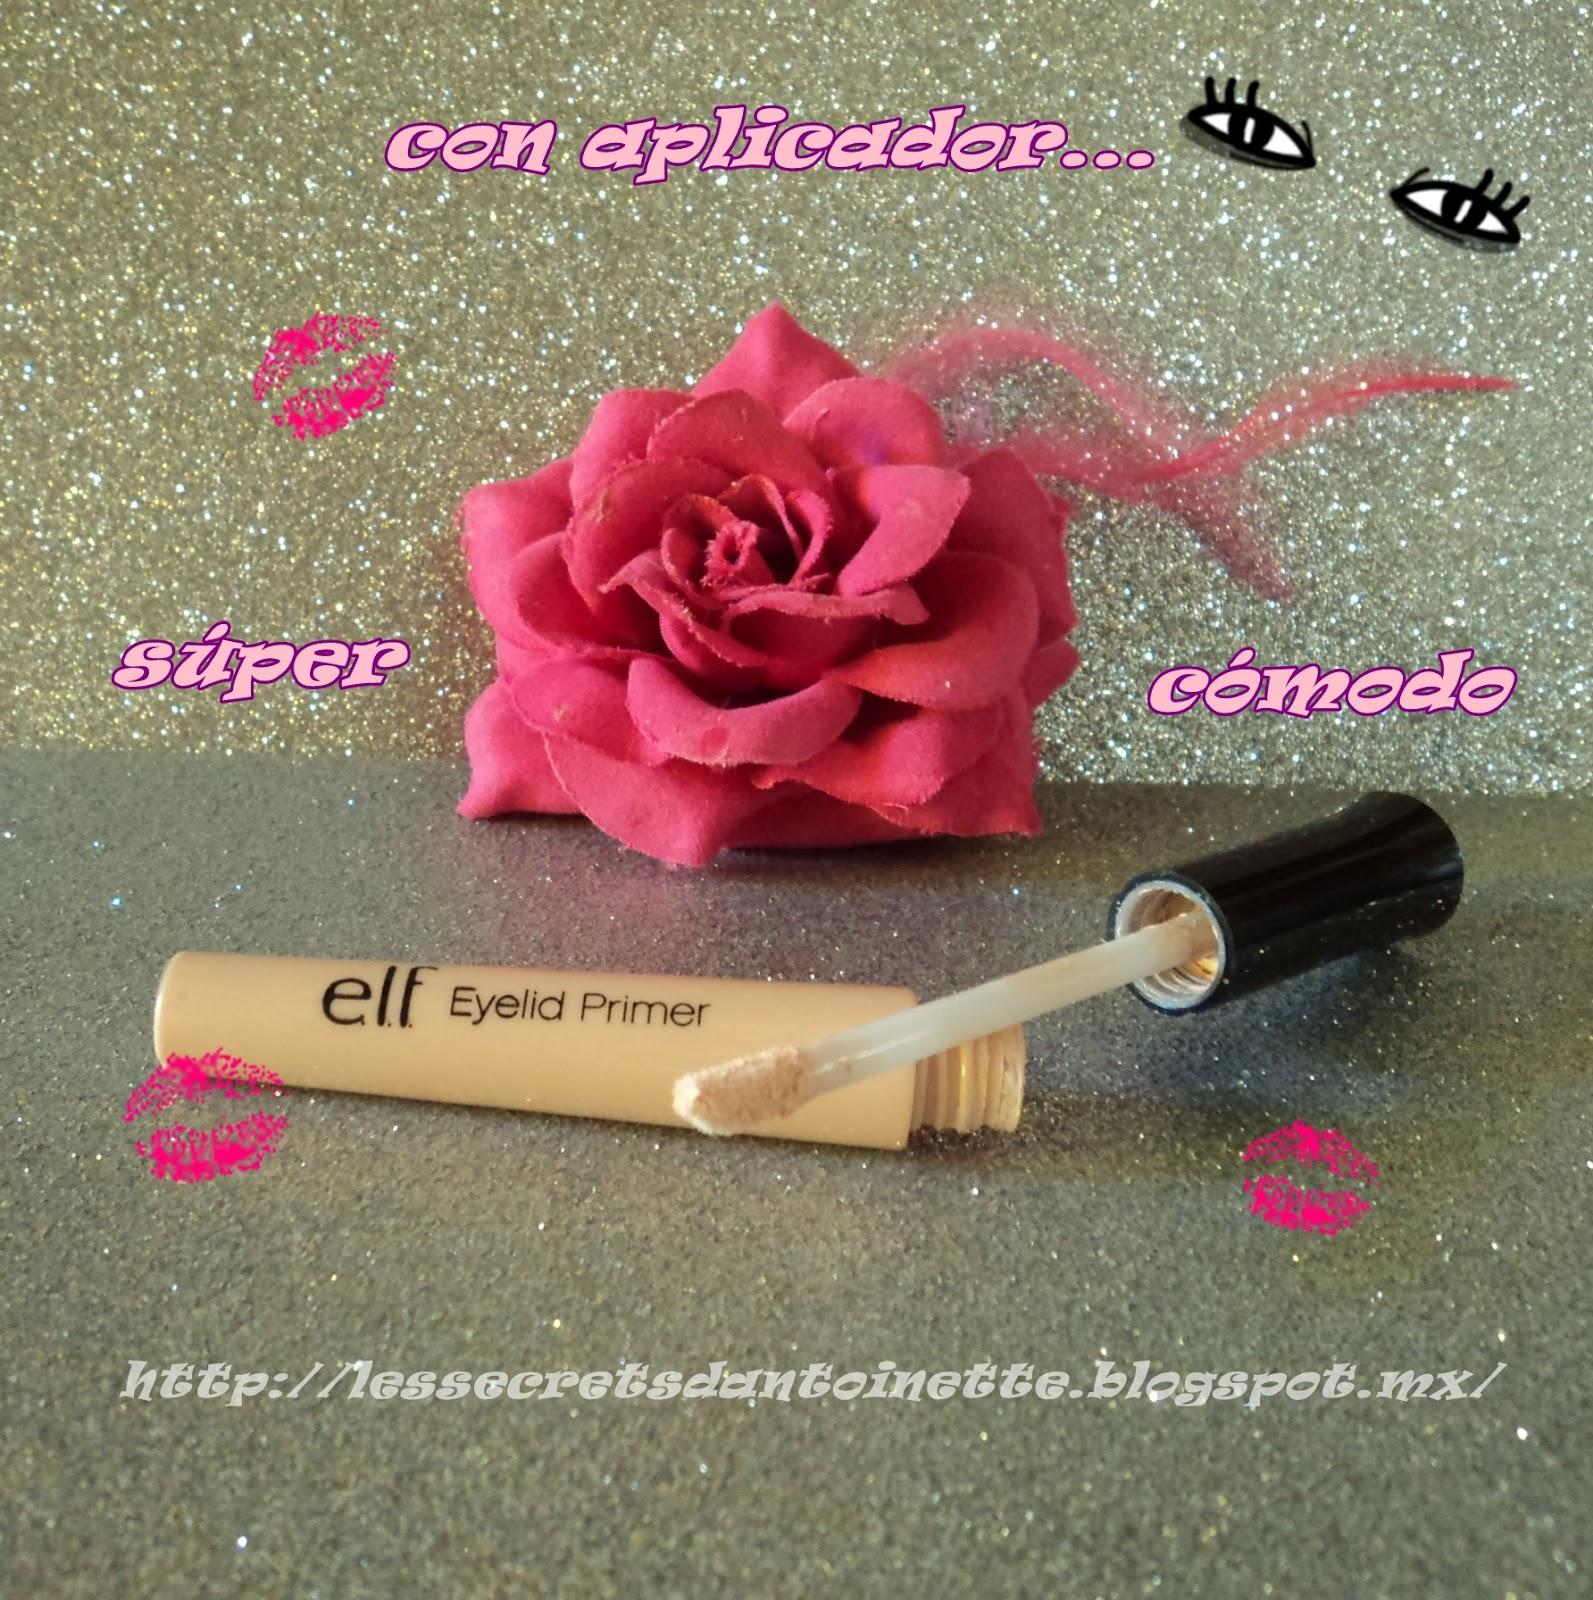 how to use elf eyelid primer